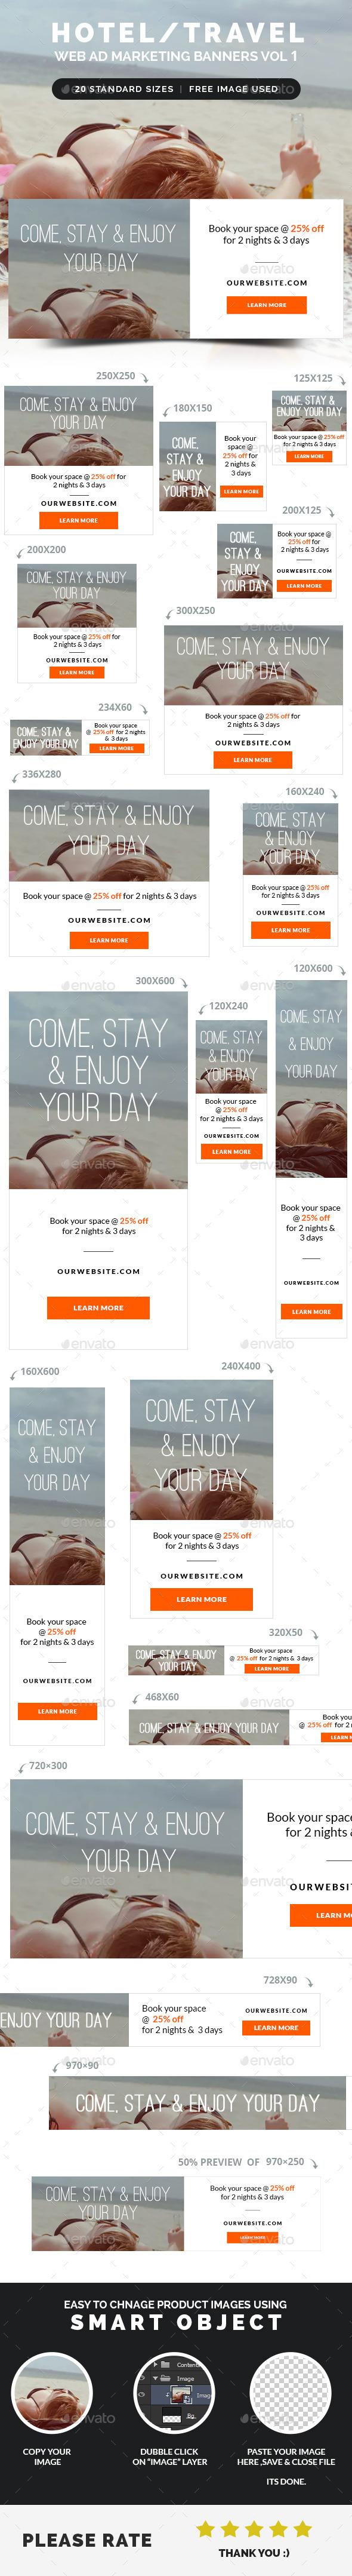 GraphicRiver Hotel Travel Web Ad Marketing Banners Vol 1 8952771